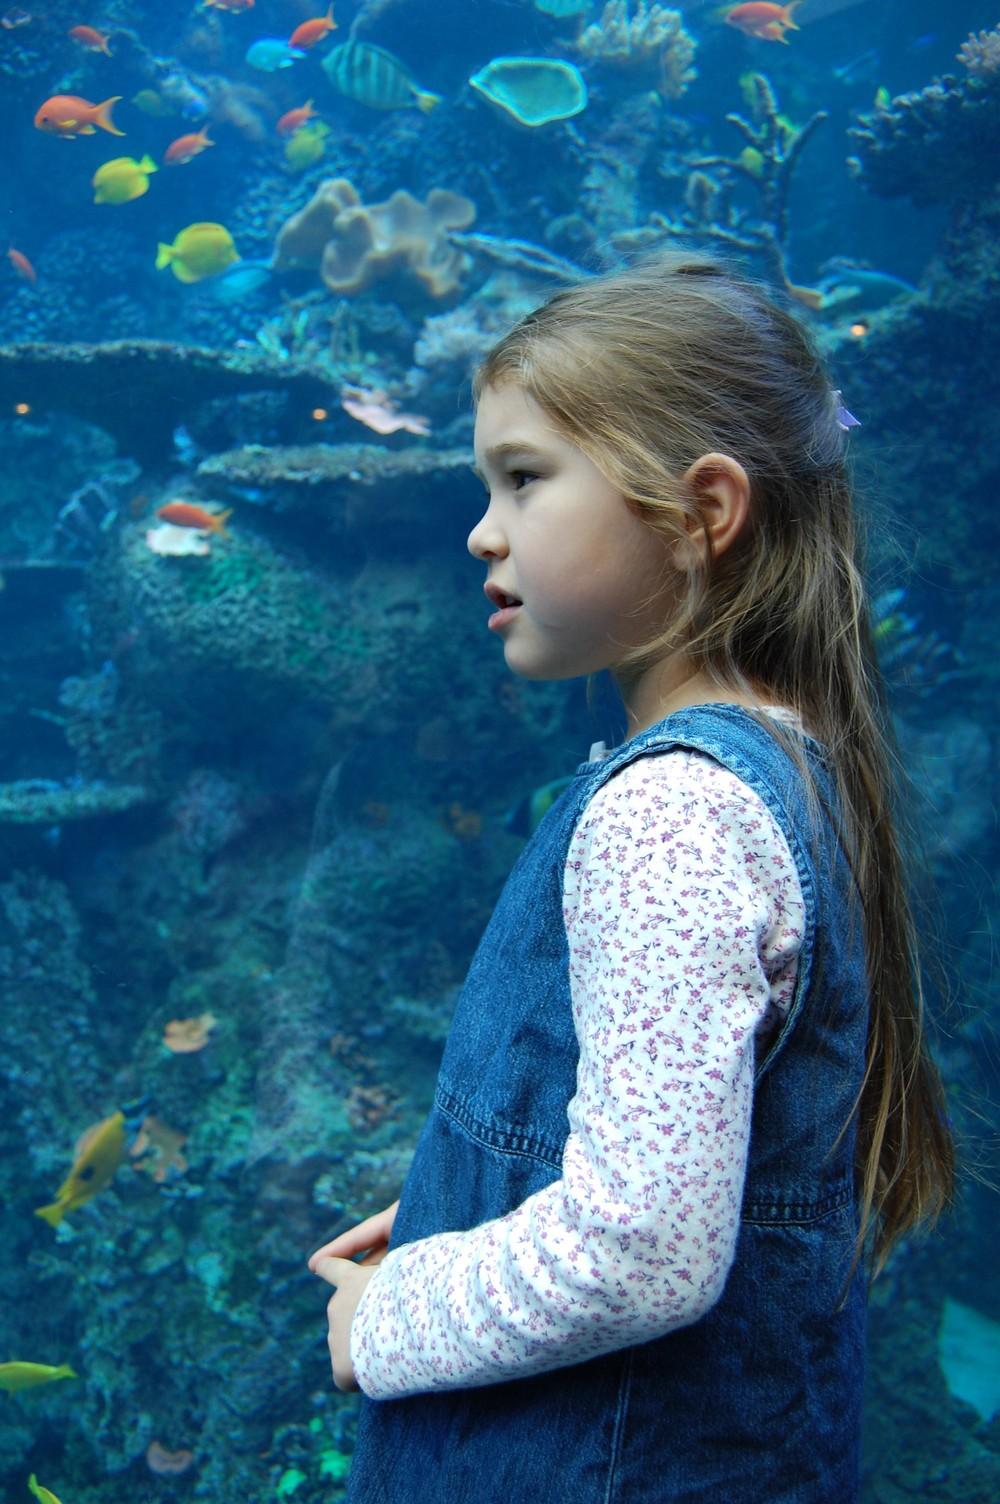 Enjoying the Atlanta, Georgia Aquarium (November 2008)